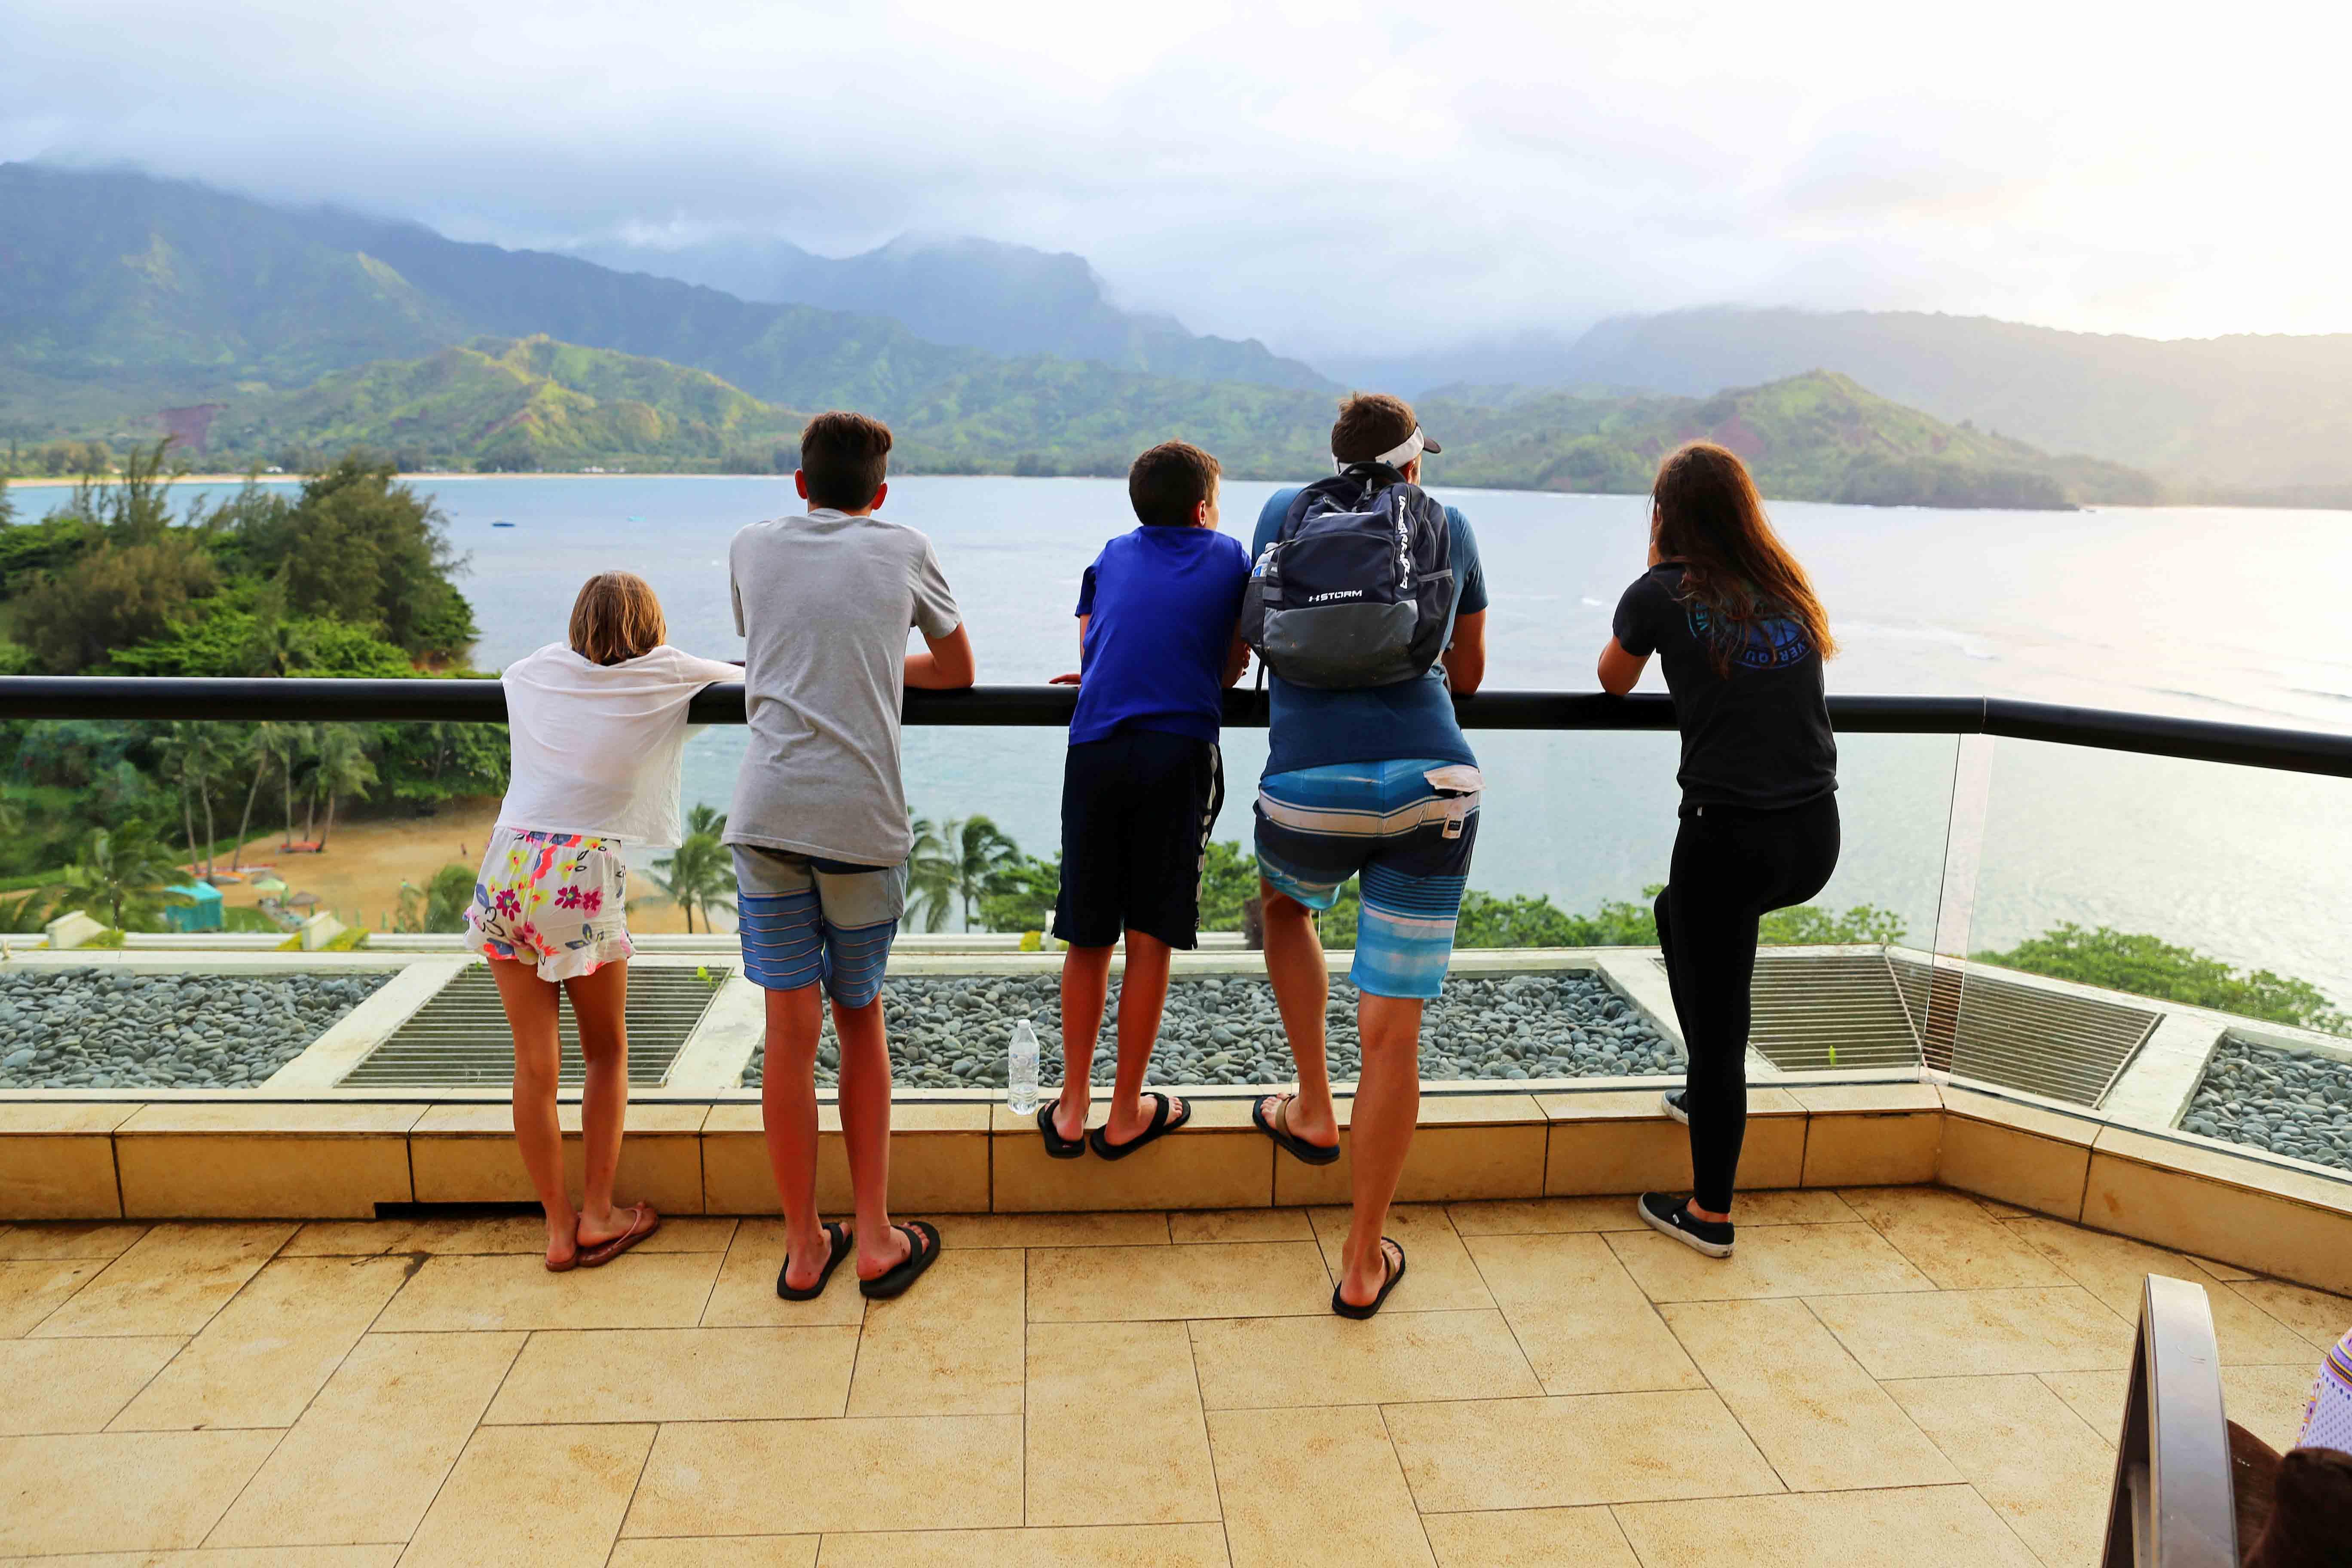 Kauai Hawaii Travel Guide. Sunset at the St. Regis Princeville Resort Kauai